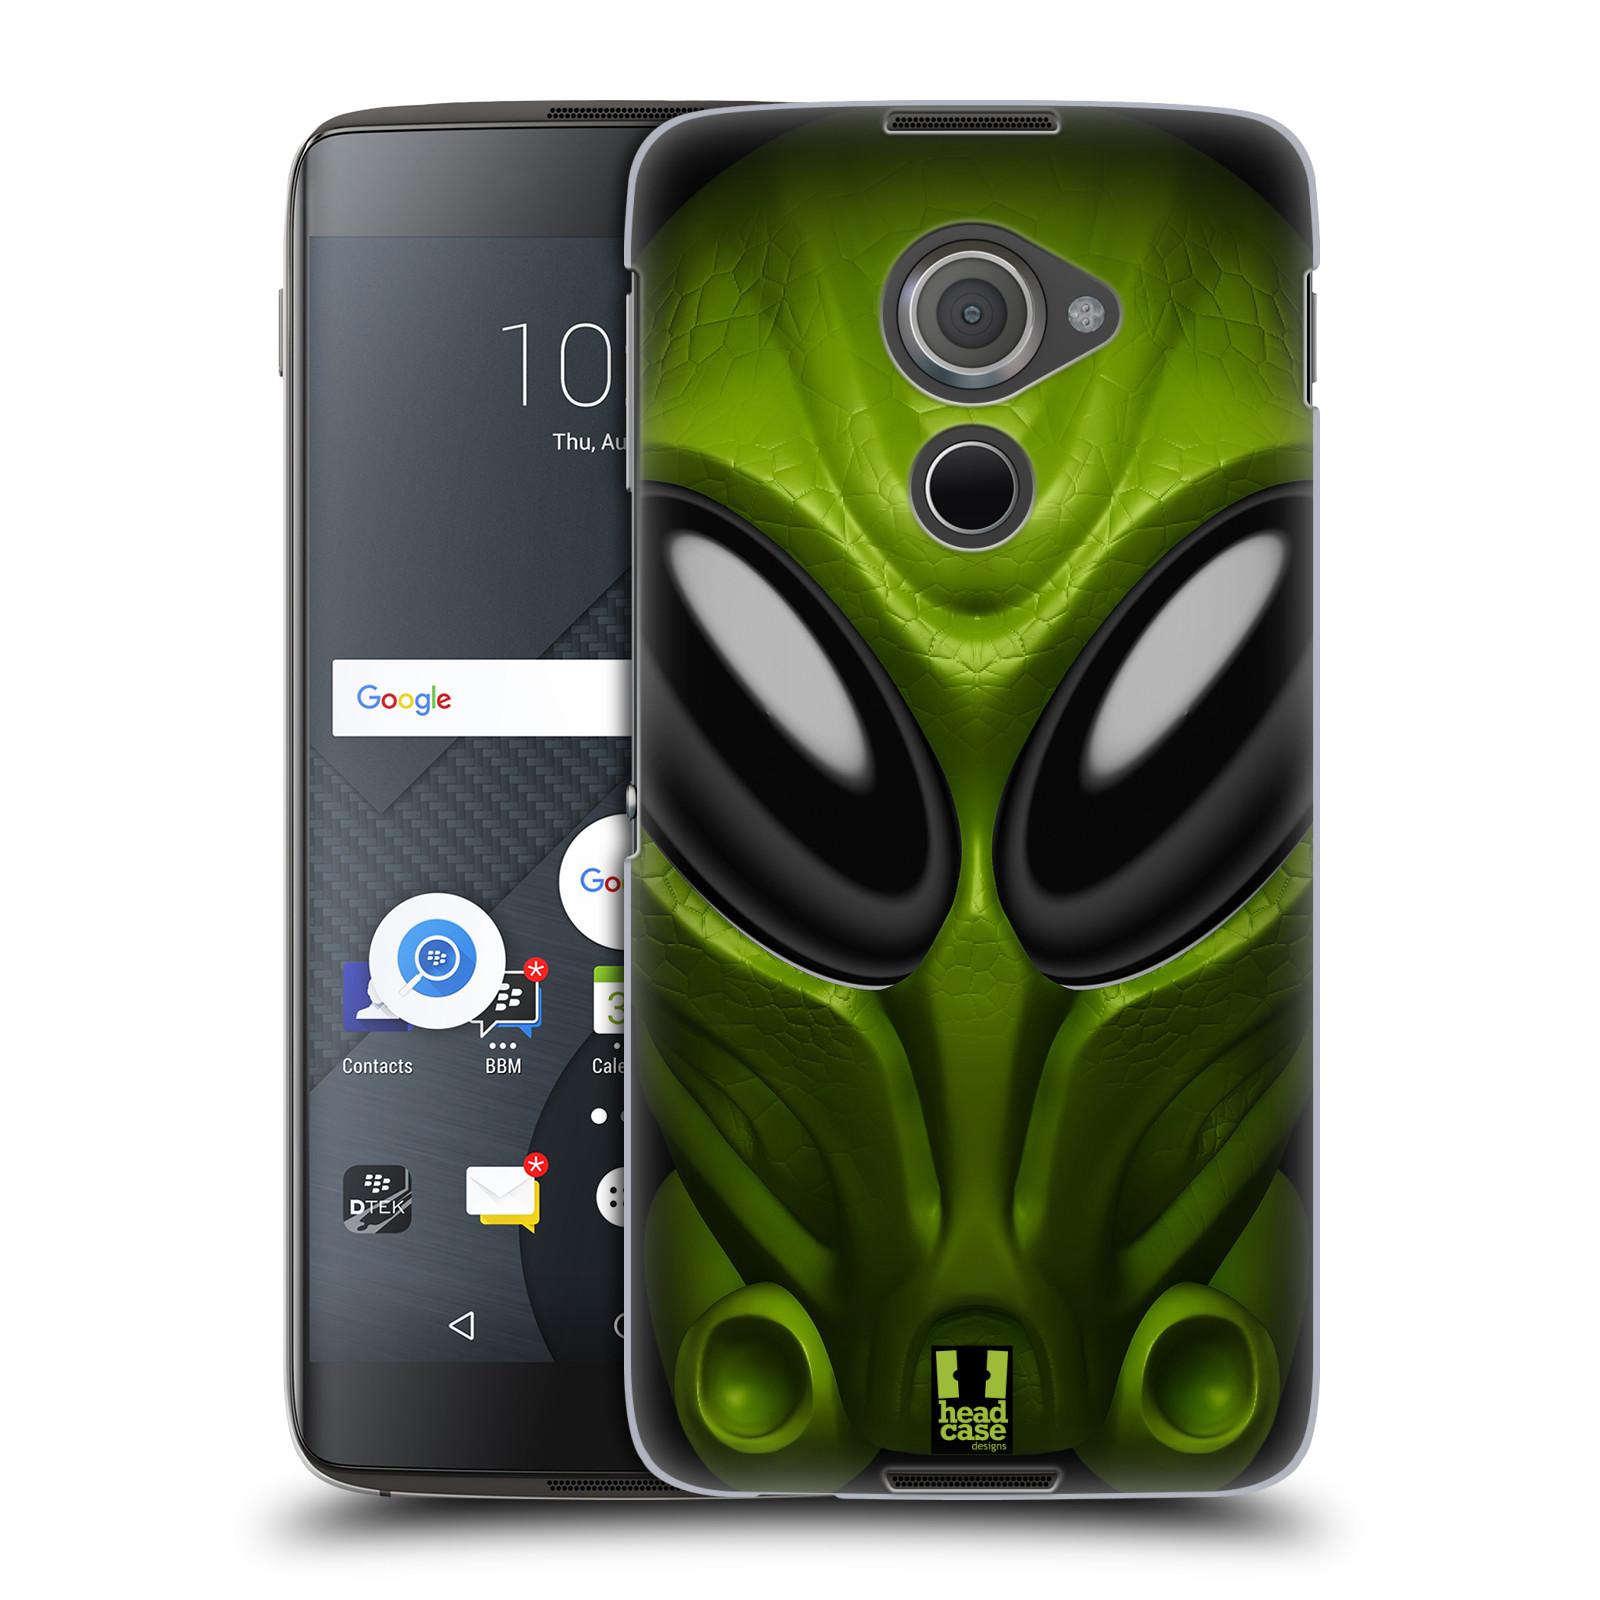 Plastové pouzdro na mobil Blackberry DTEK60 (Argon) - Head Case - Ufoun Mastermind